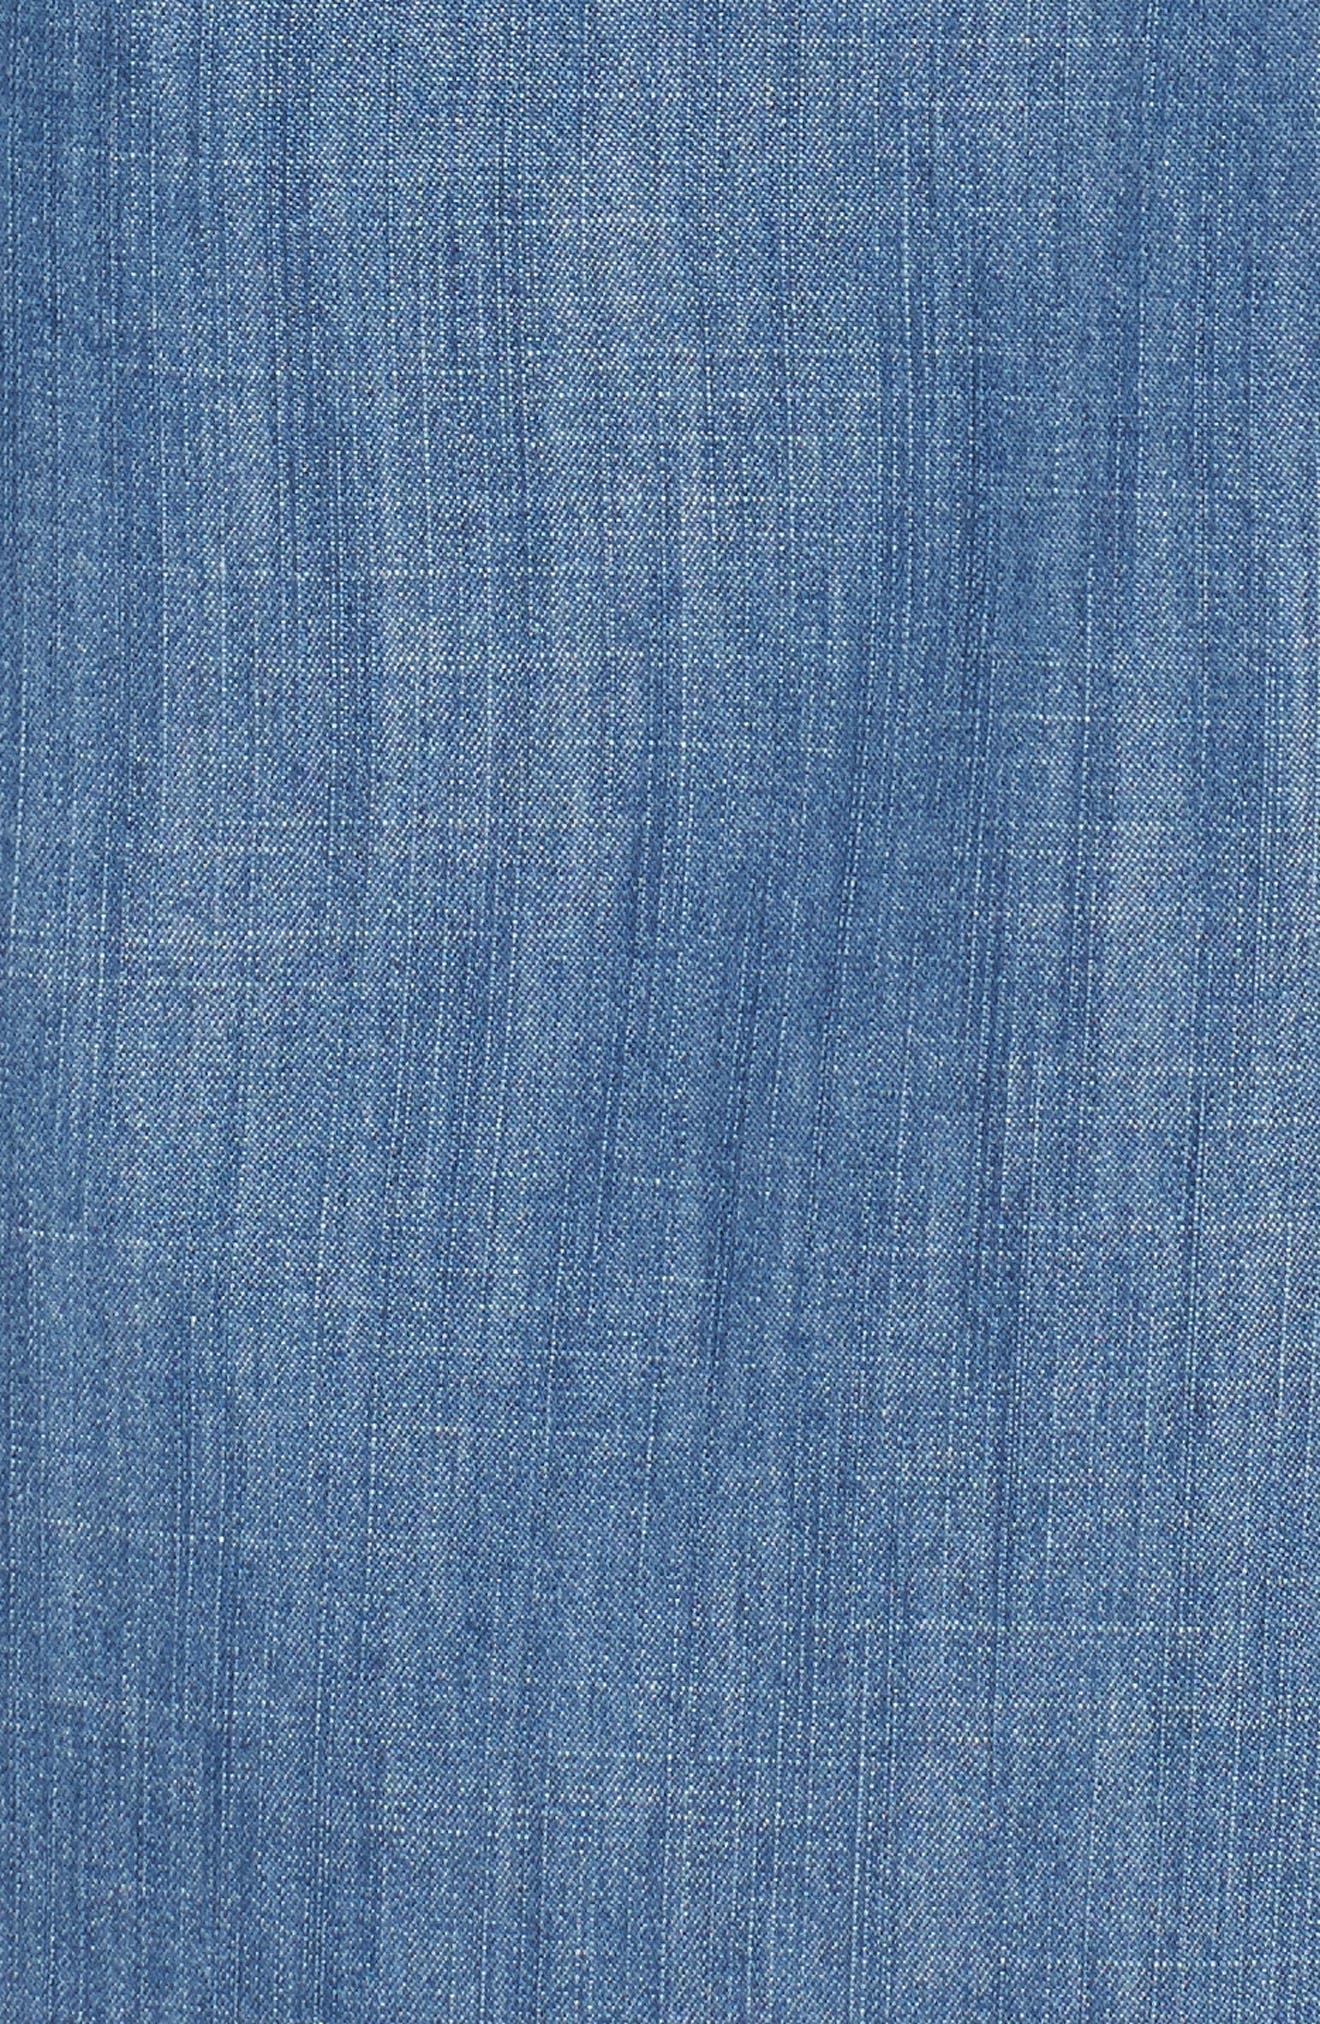 Dorado Keyhole Chambray Dress,                             Alternate thumbnail 5, color,                             400